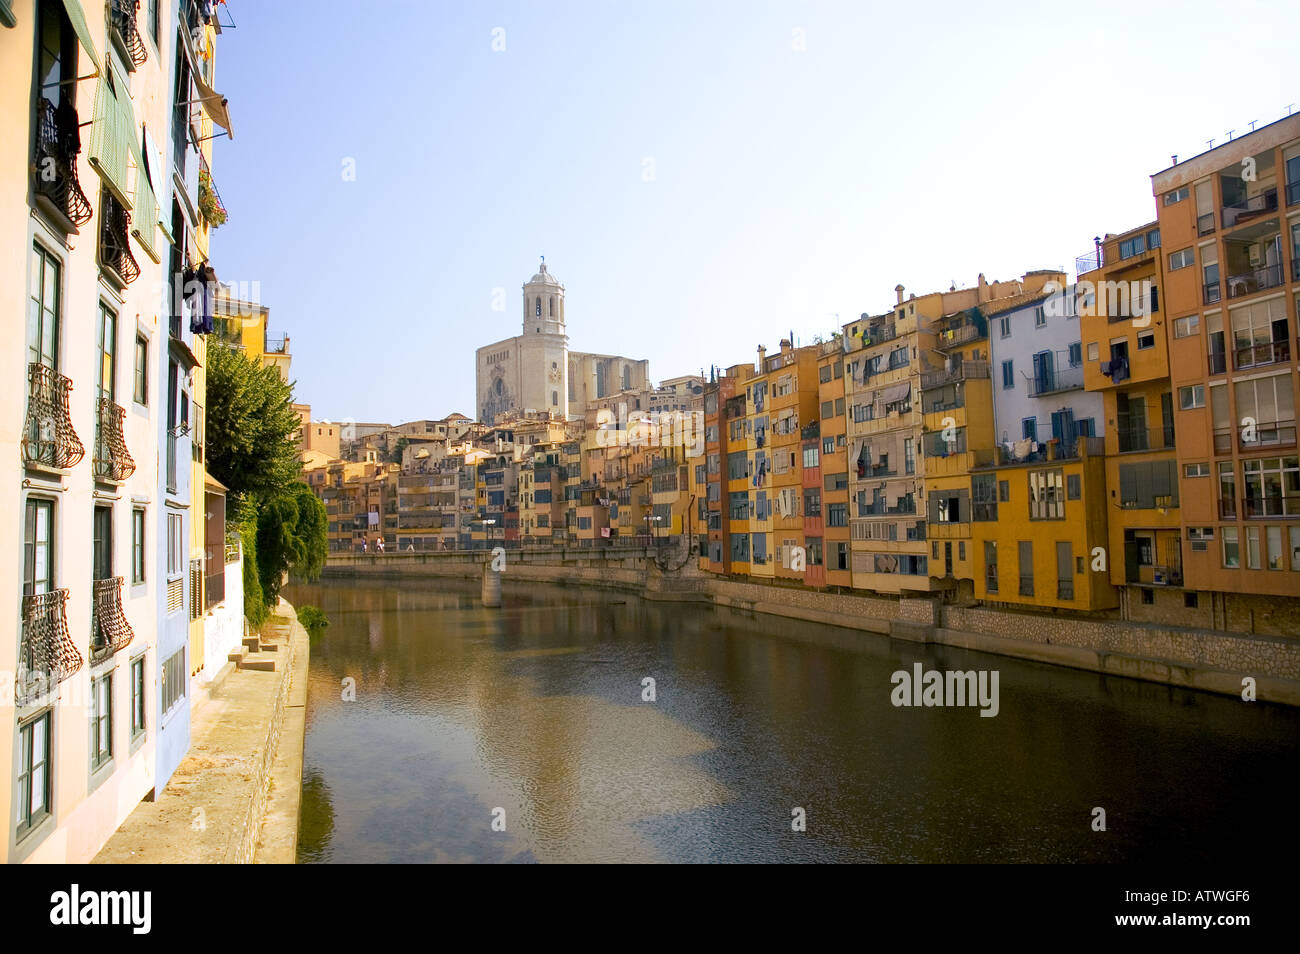 Apartamentos Riverside, junto al río Onyar, en Girona, Cataluña, España. Imagen De Stock